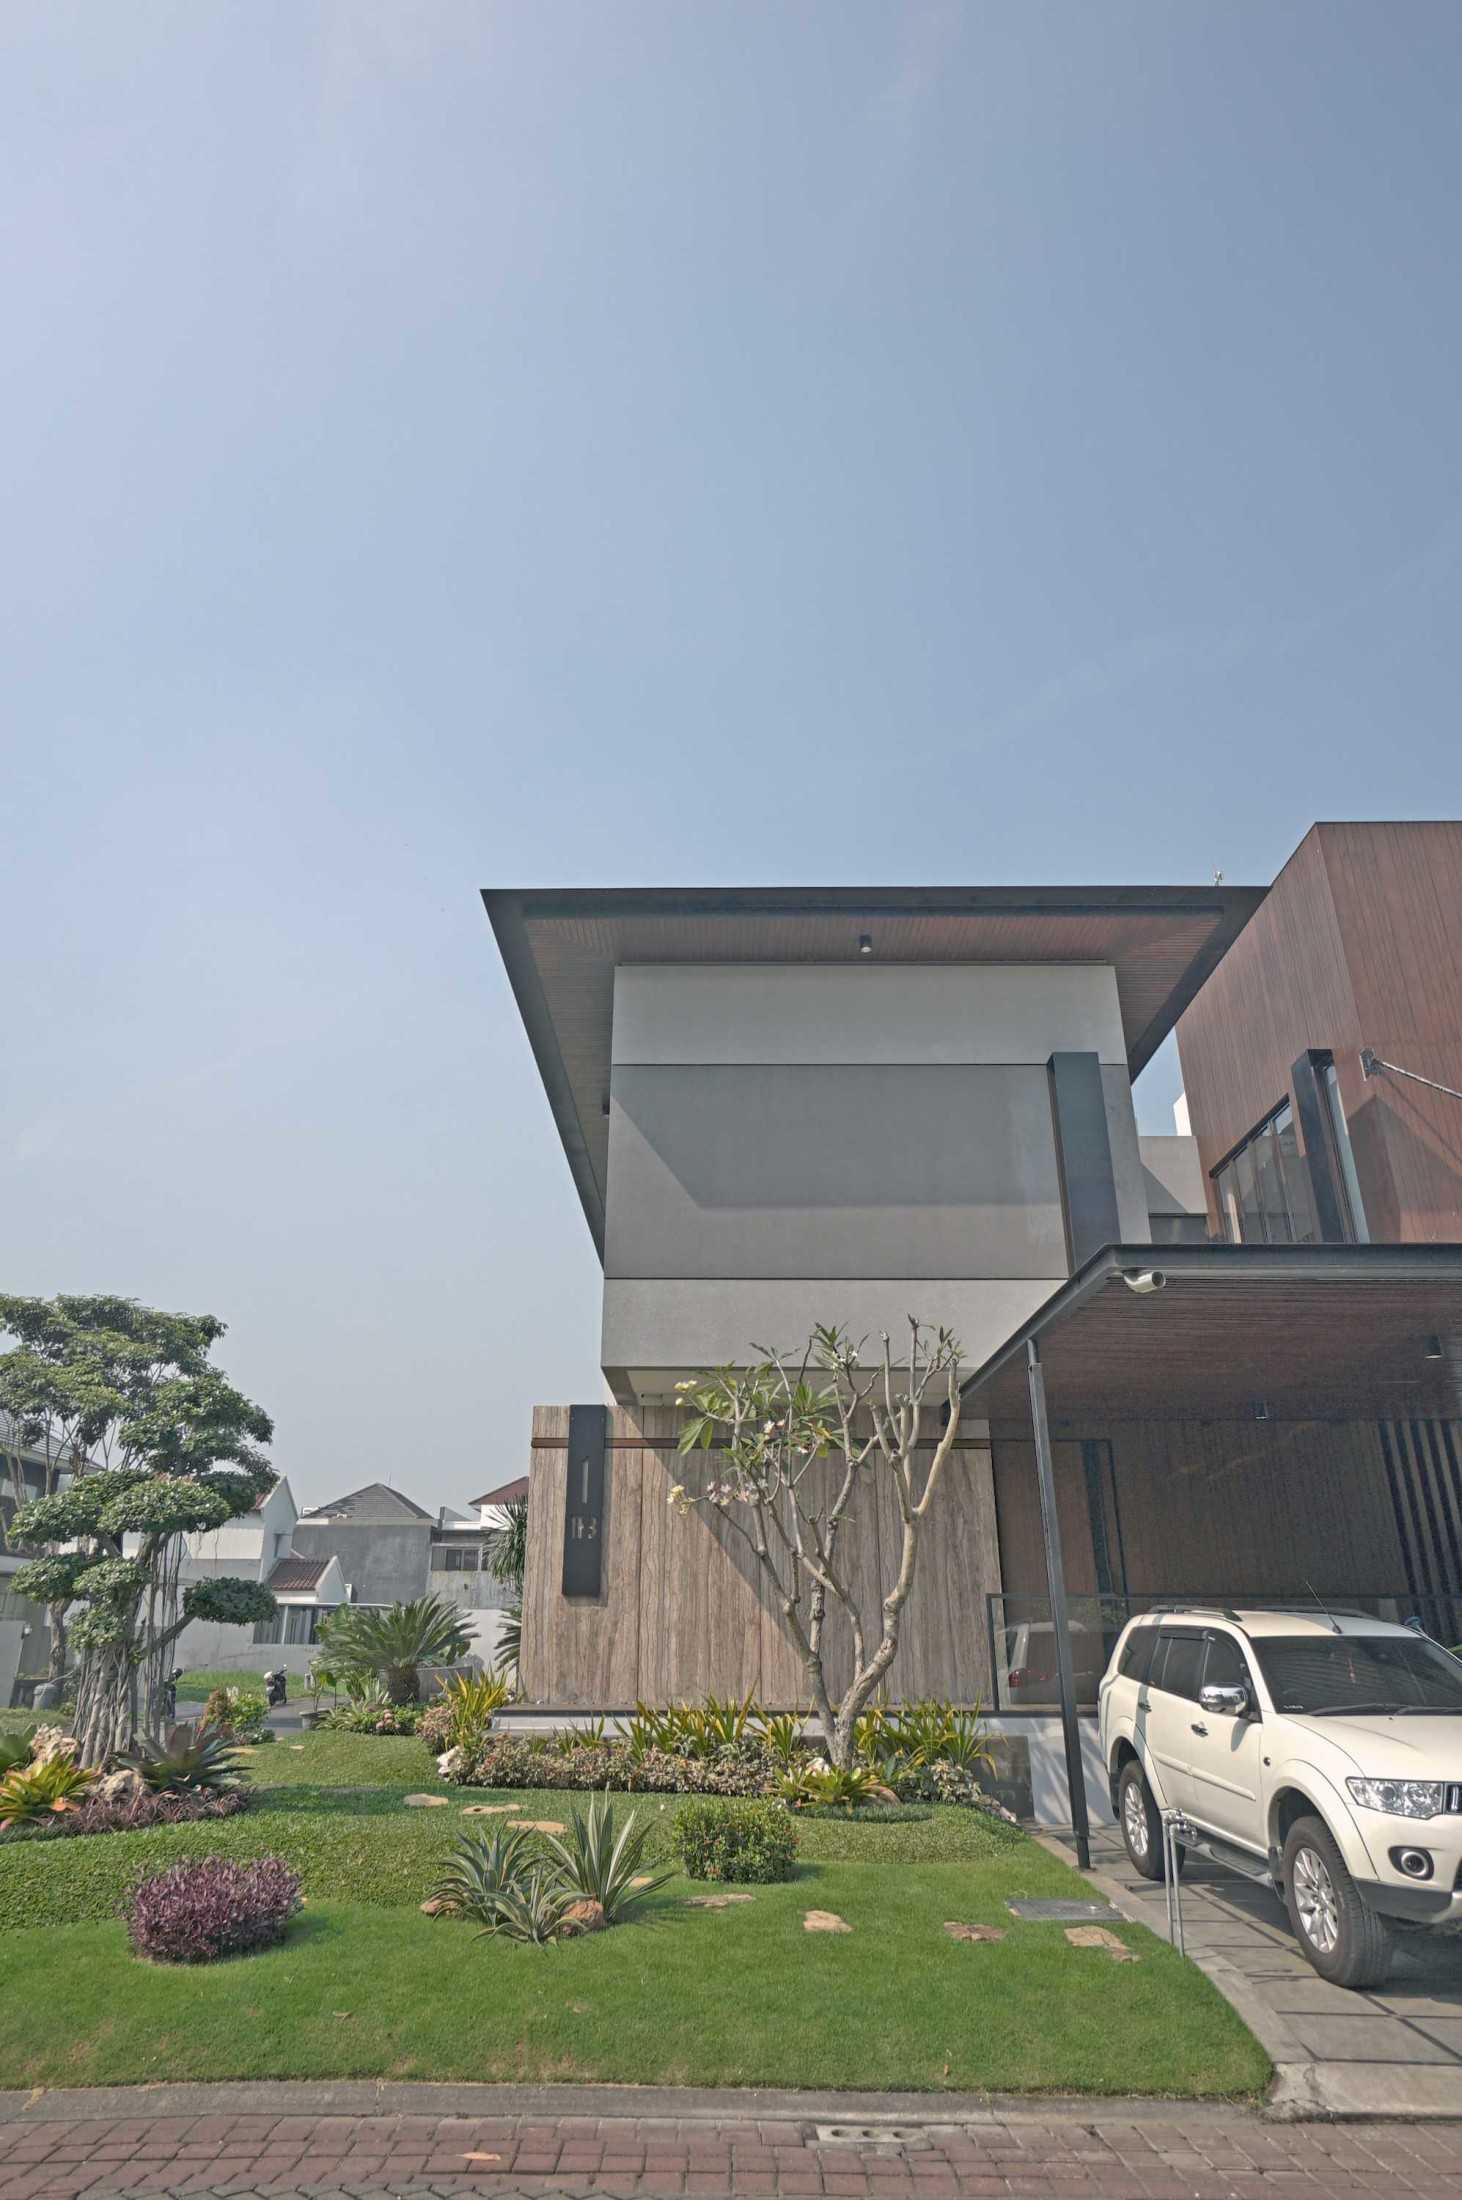 Rendic Ho Dw House Surabaya, Kota Sby, Jawa Timur, Indonesia Surabaya, Kota Sby, Jawa Timur, Indonesia Rendic-Ho-Dw-House  107063